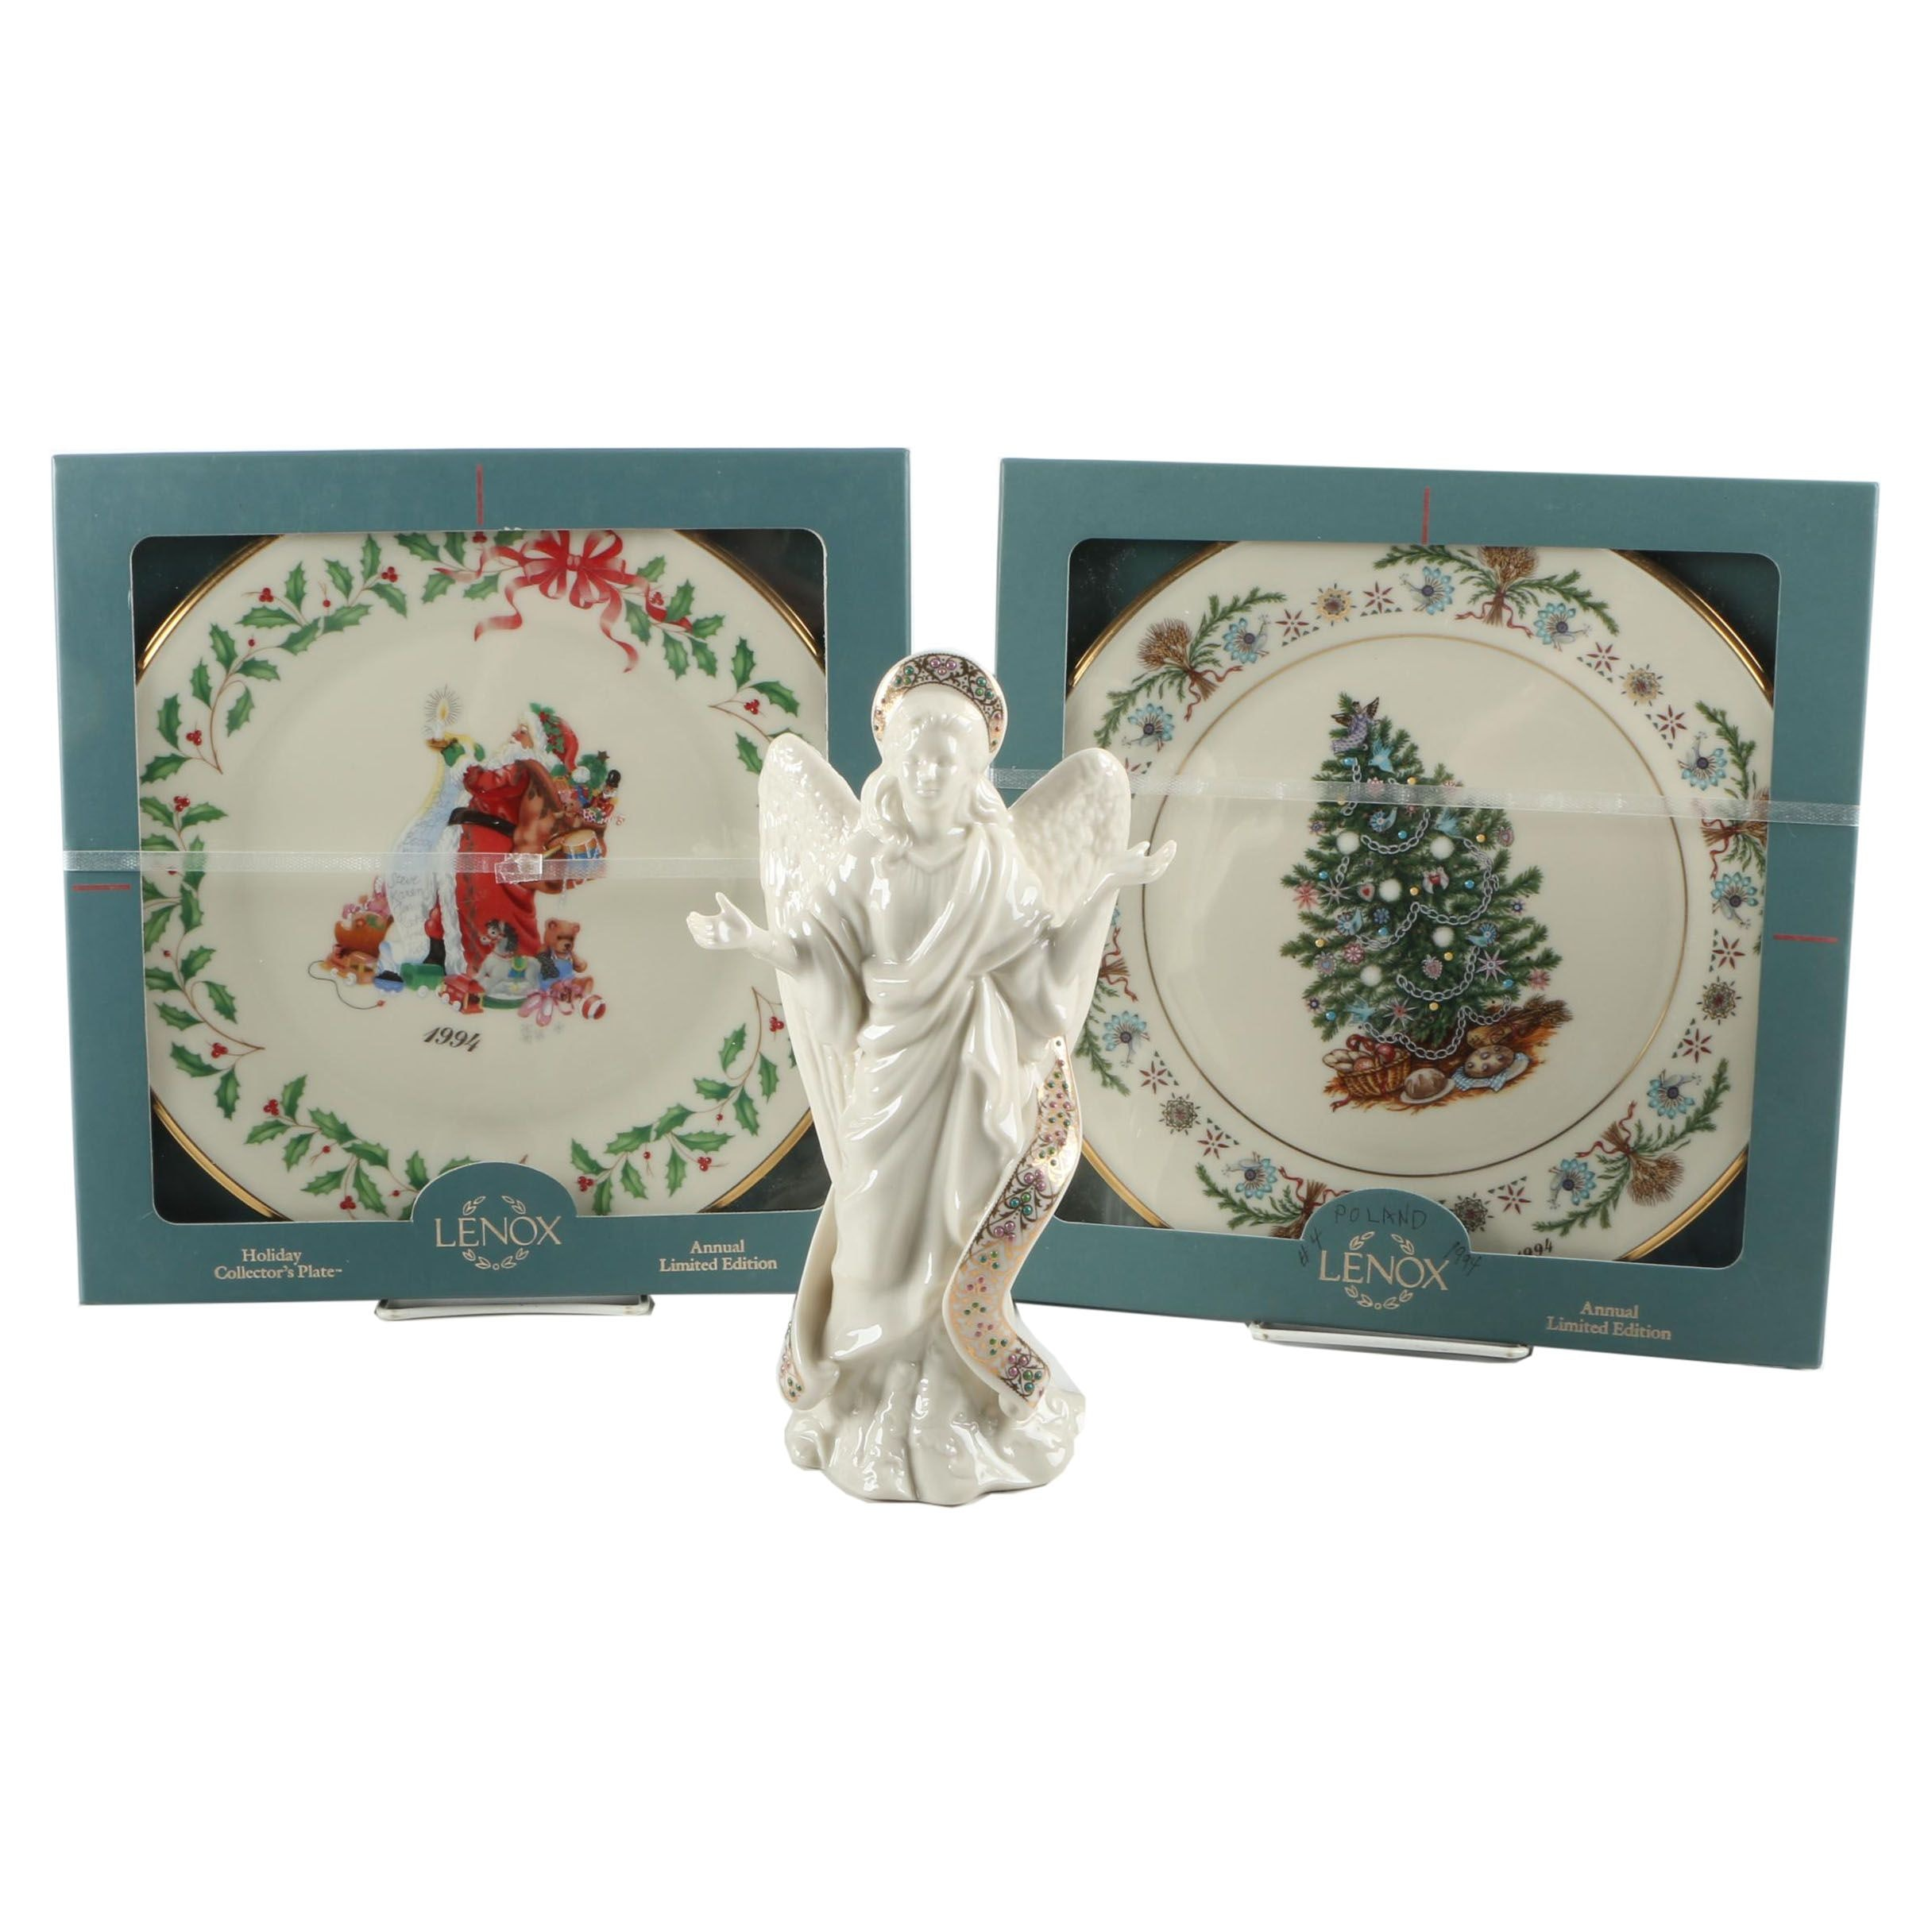 "Lenox Limited Edition Christmas Plates and 1995 ""Angel of Light"" Figurine"